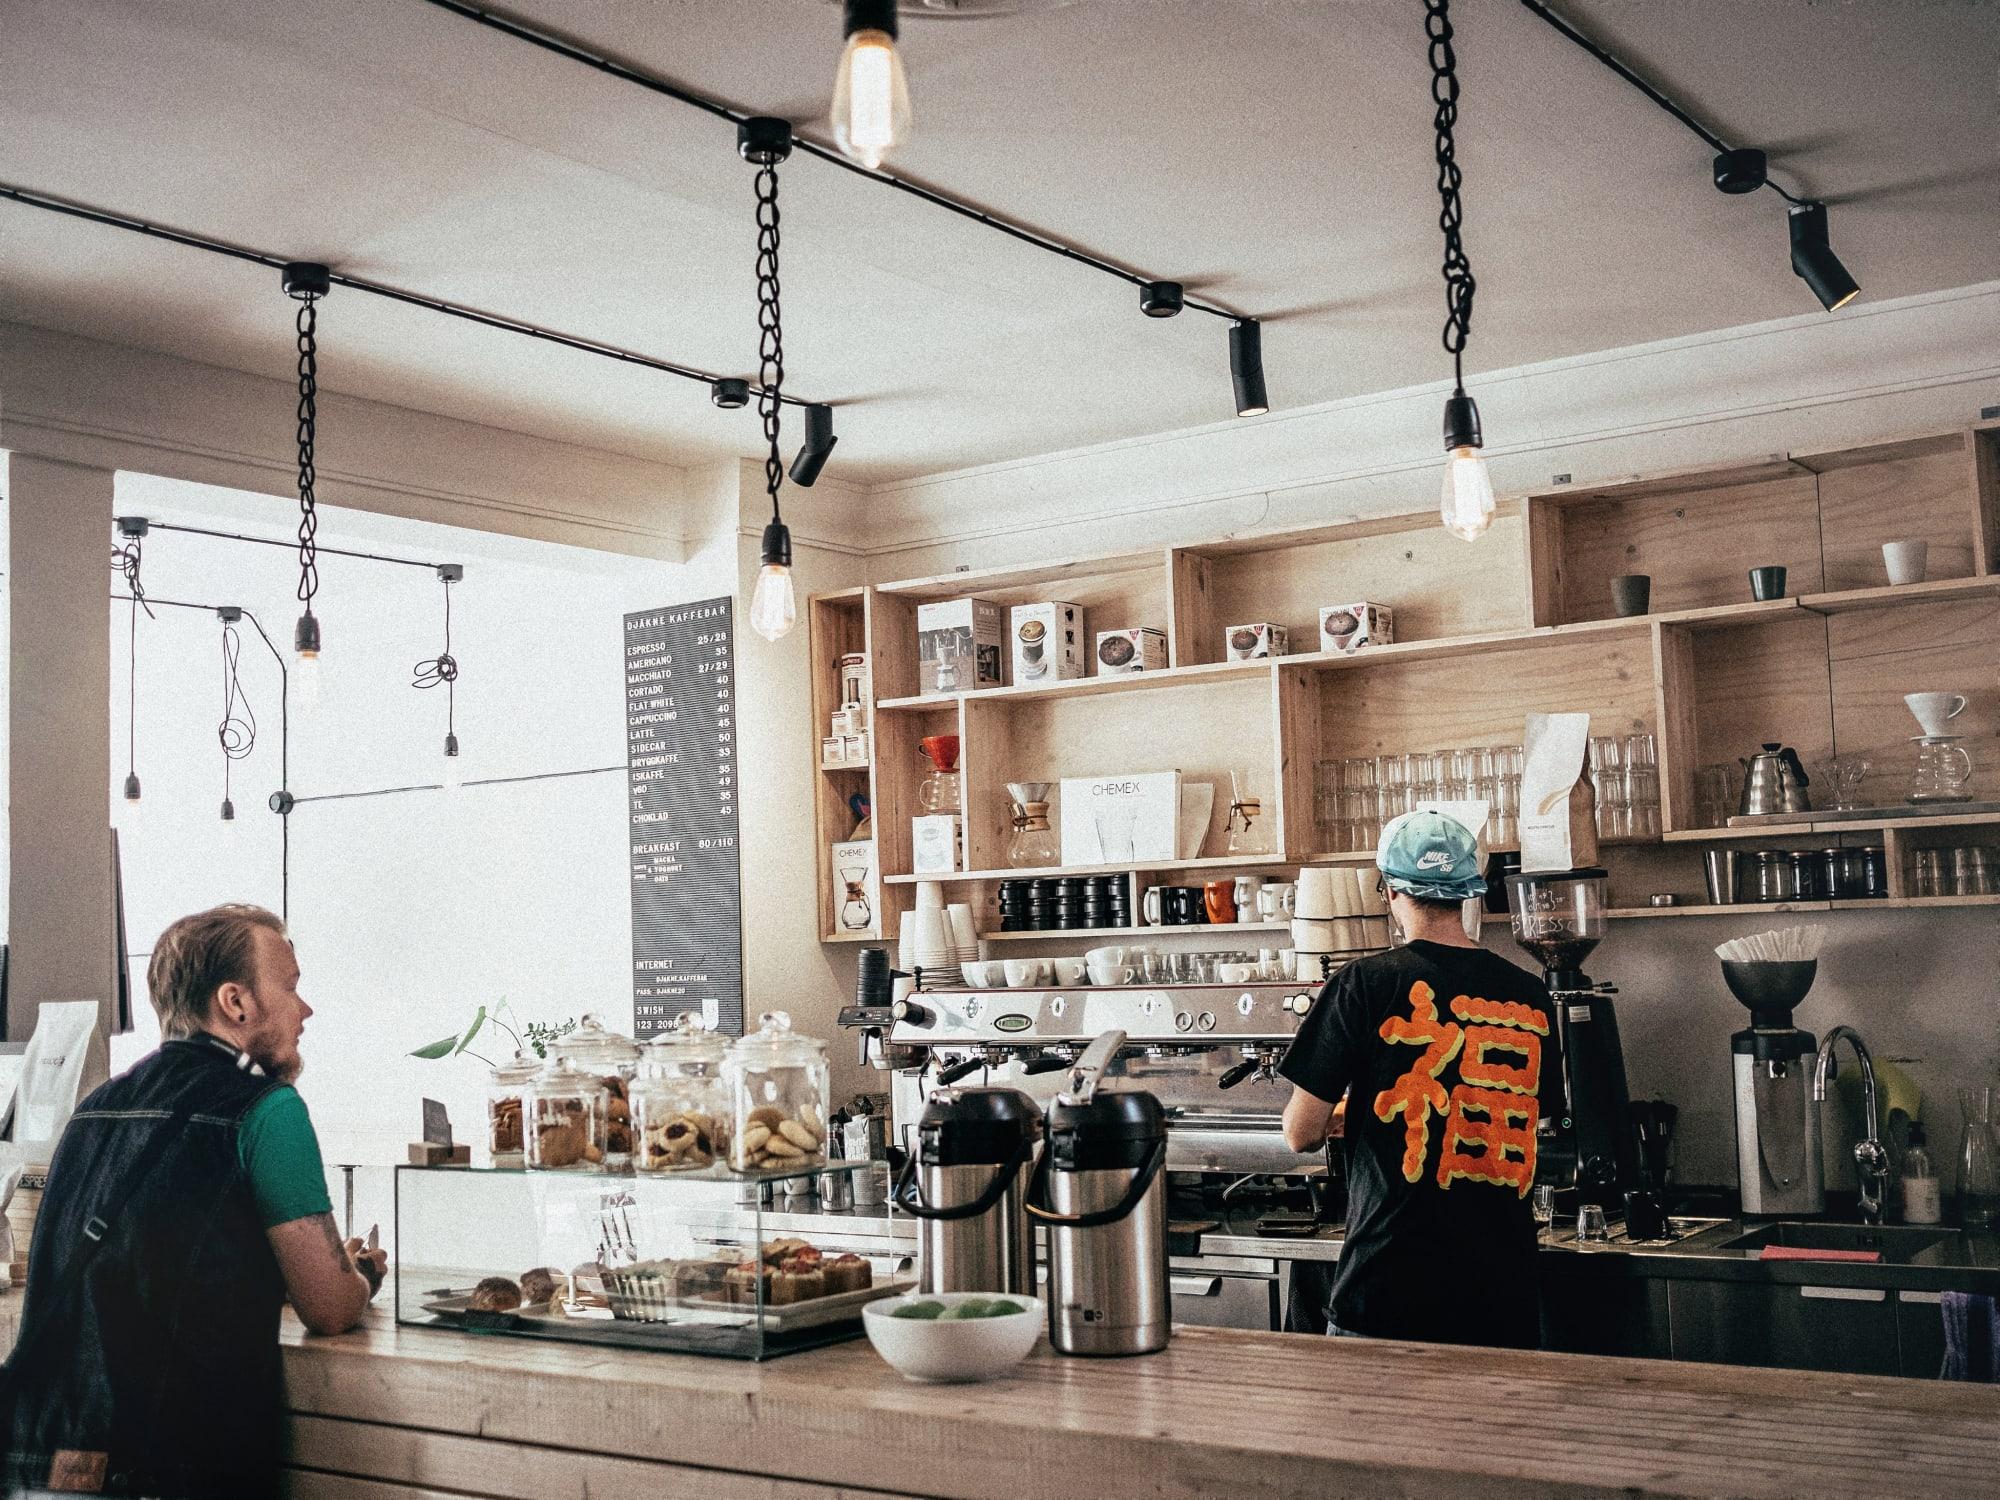 In 2011 Djäkne Startup Studio opened a new modern office space at Djäknegatan 9 in Malmö that combined a startup studio, a coworking space and a public coffee bar.